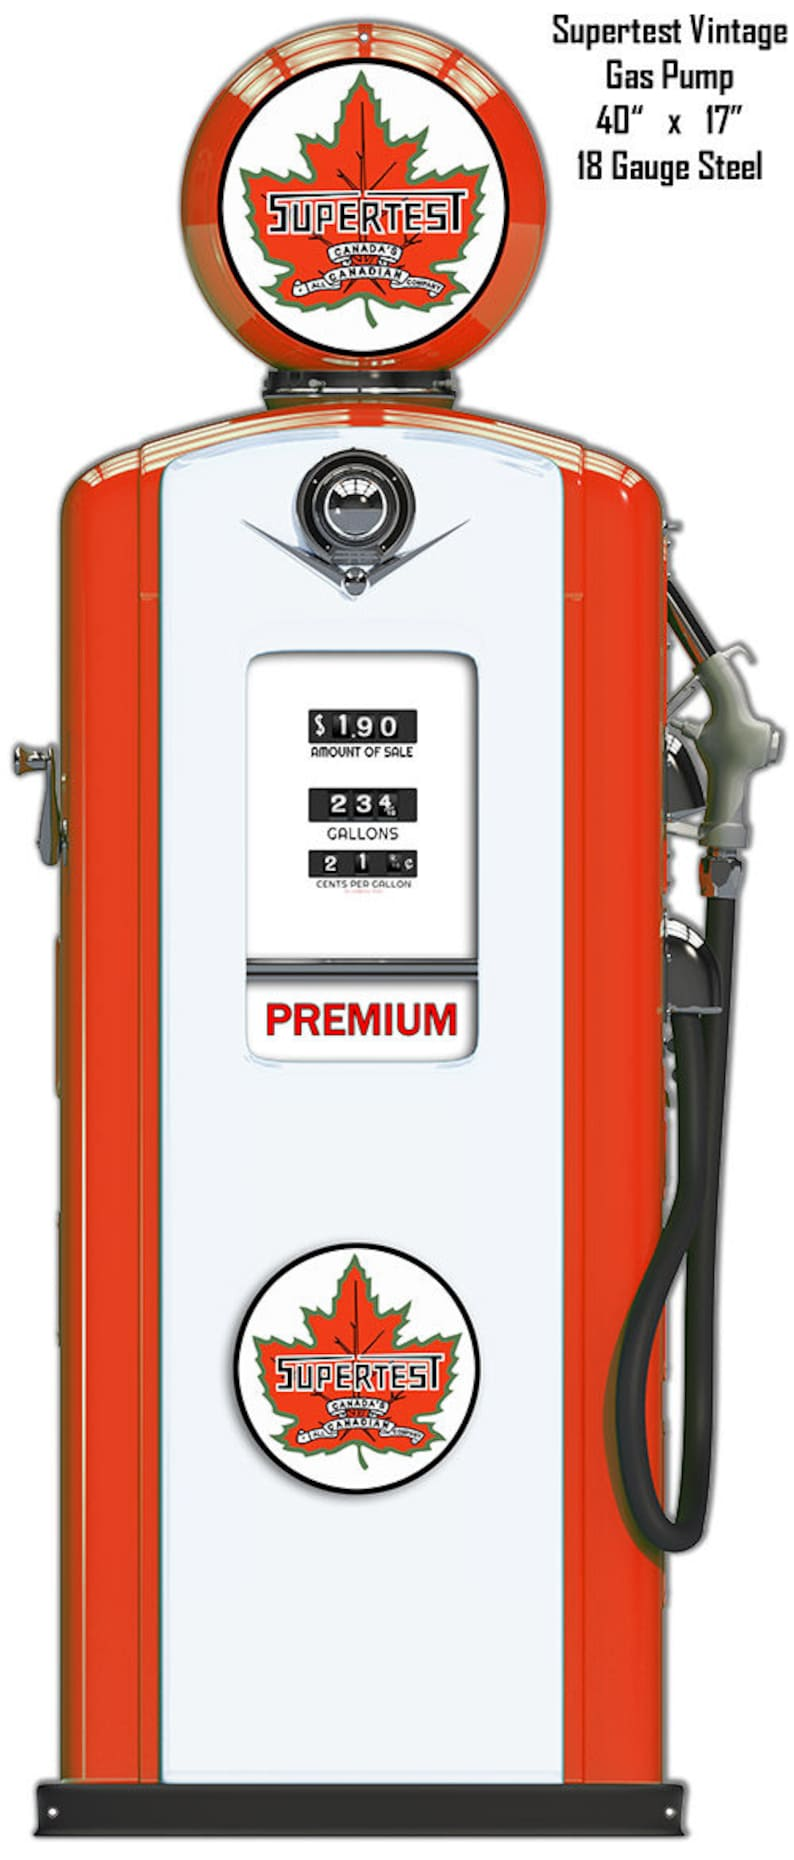 custom shape vintage style retro gas oil garage art wall decor RG 87135 Laser Cutout Metal Sign Supertest Gas Station Pump